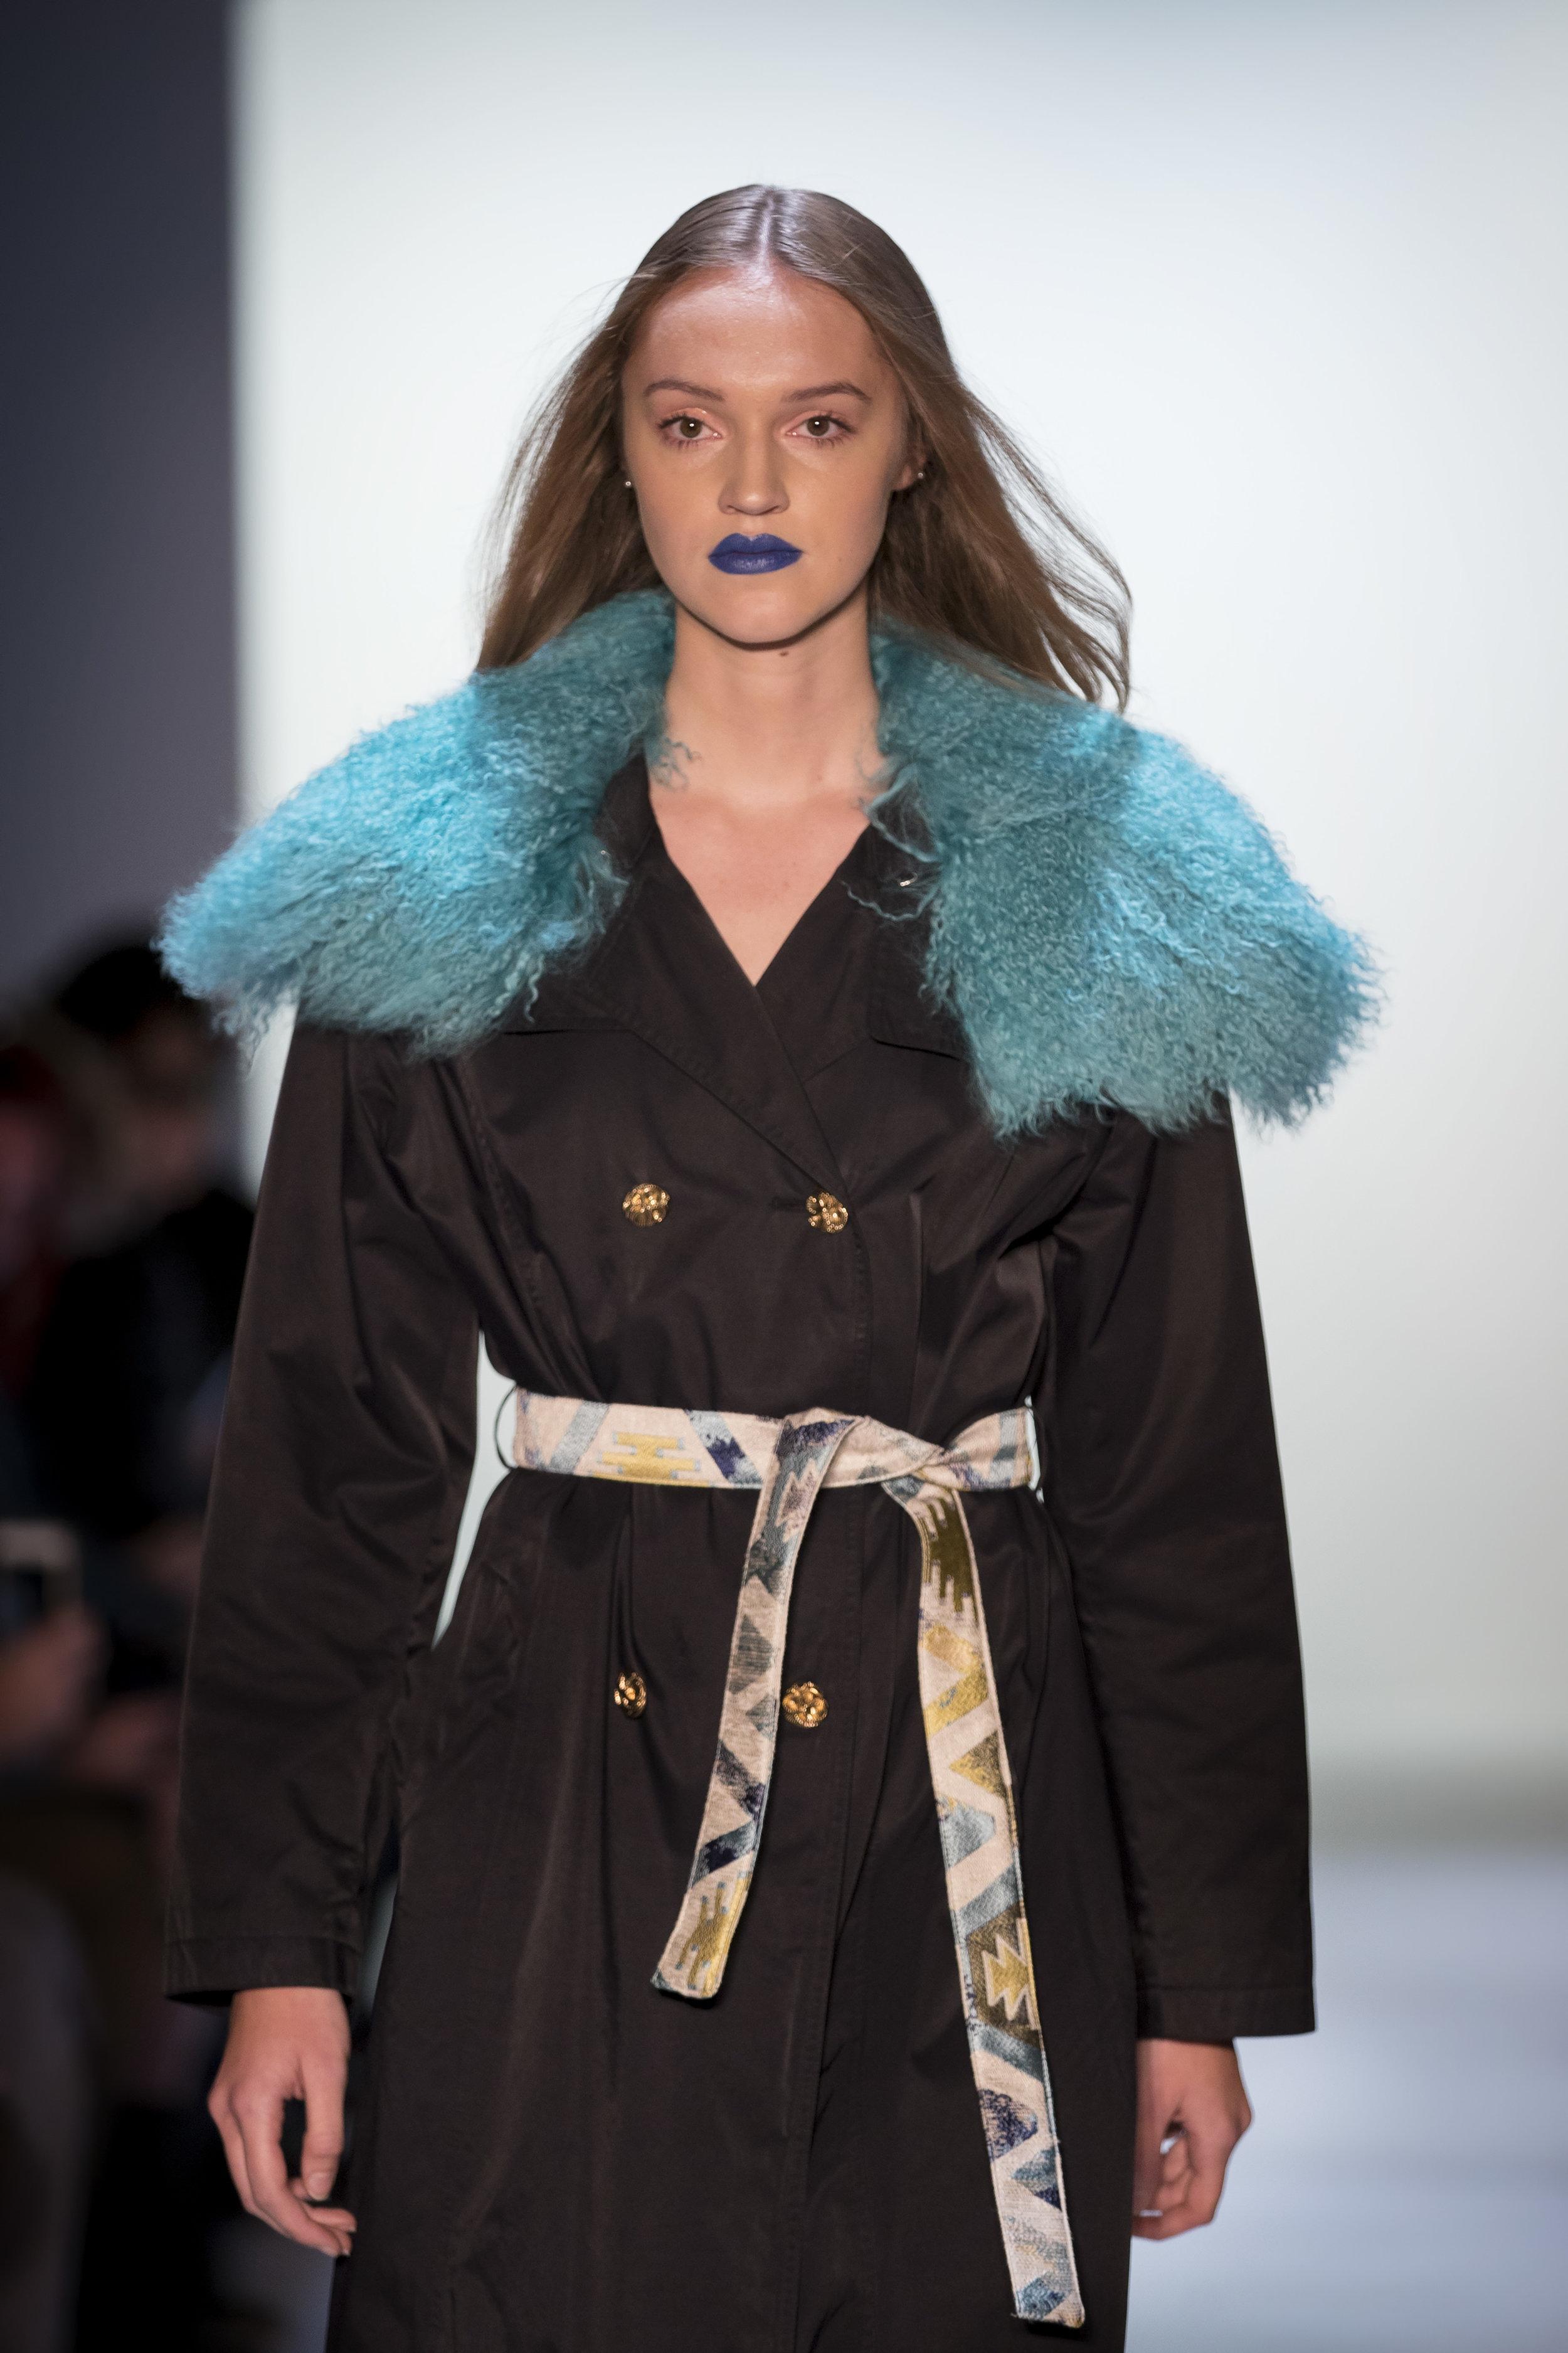 Massif Fashion Week 2017 Day 4 GIA New York Guillermo Irias - 003.jpg